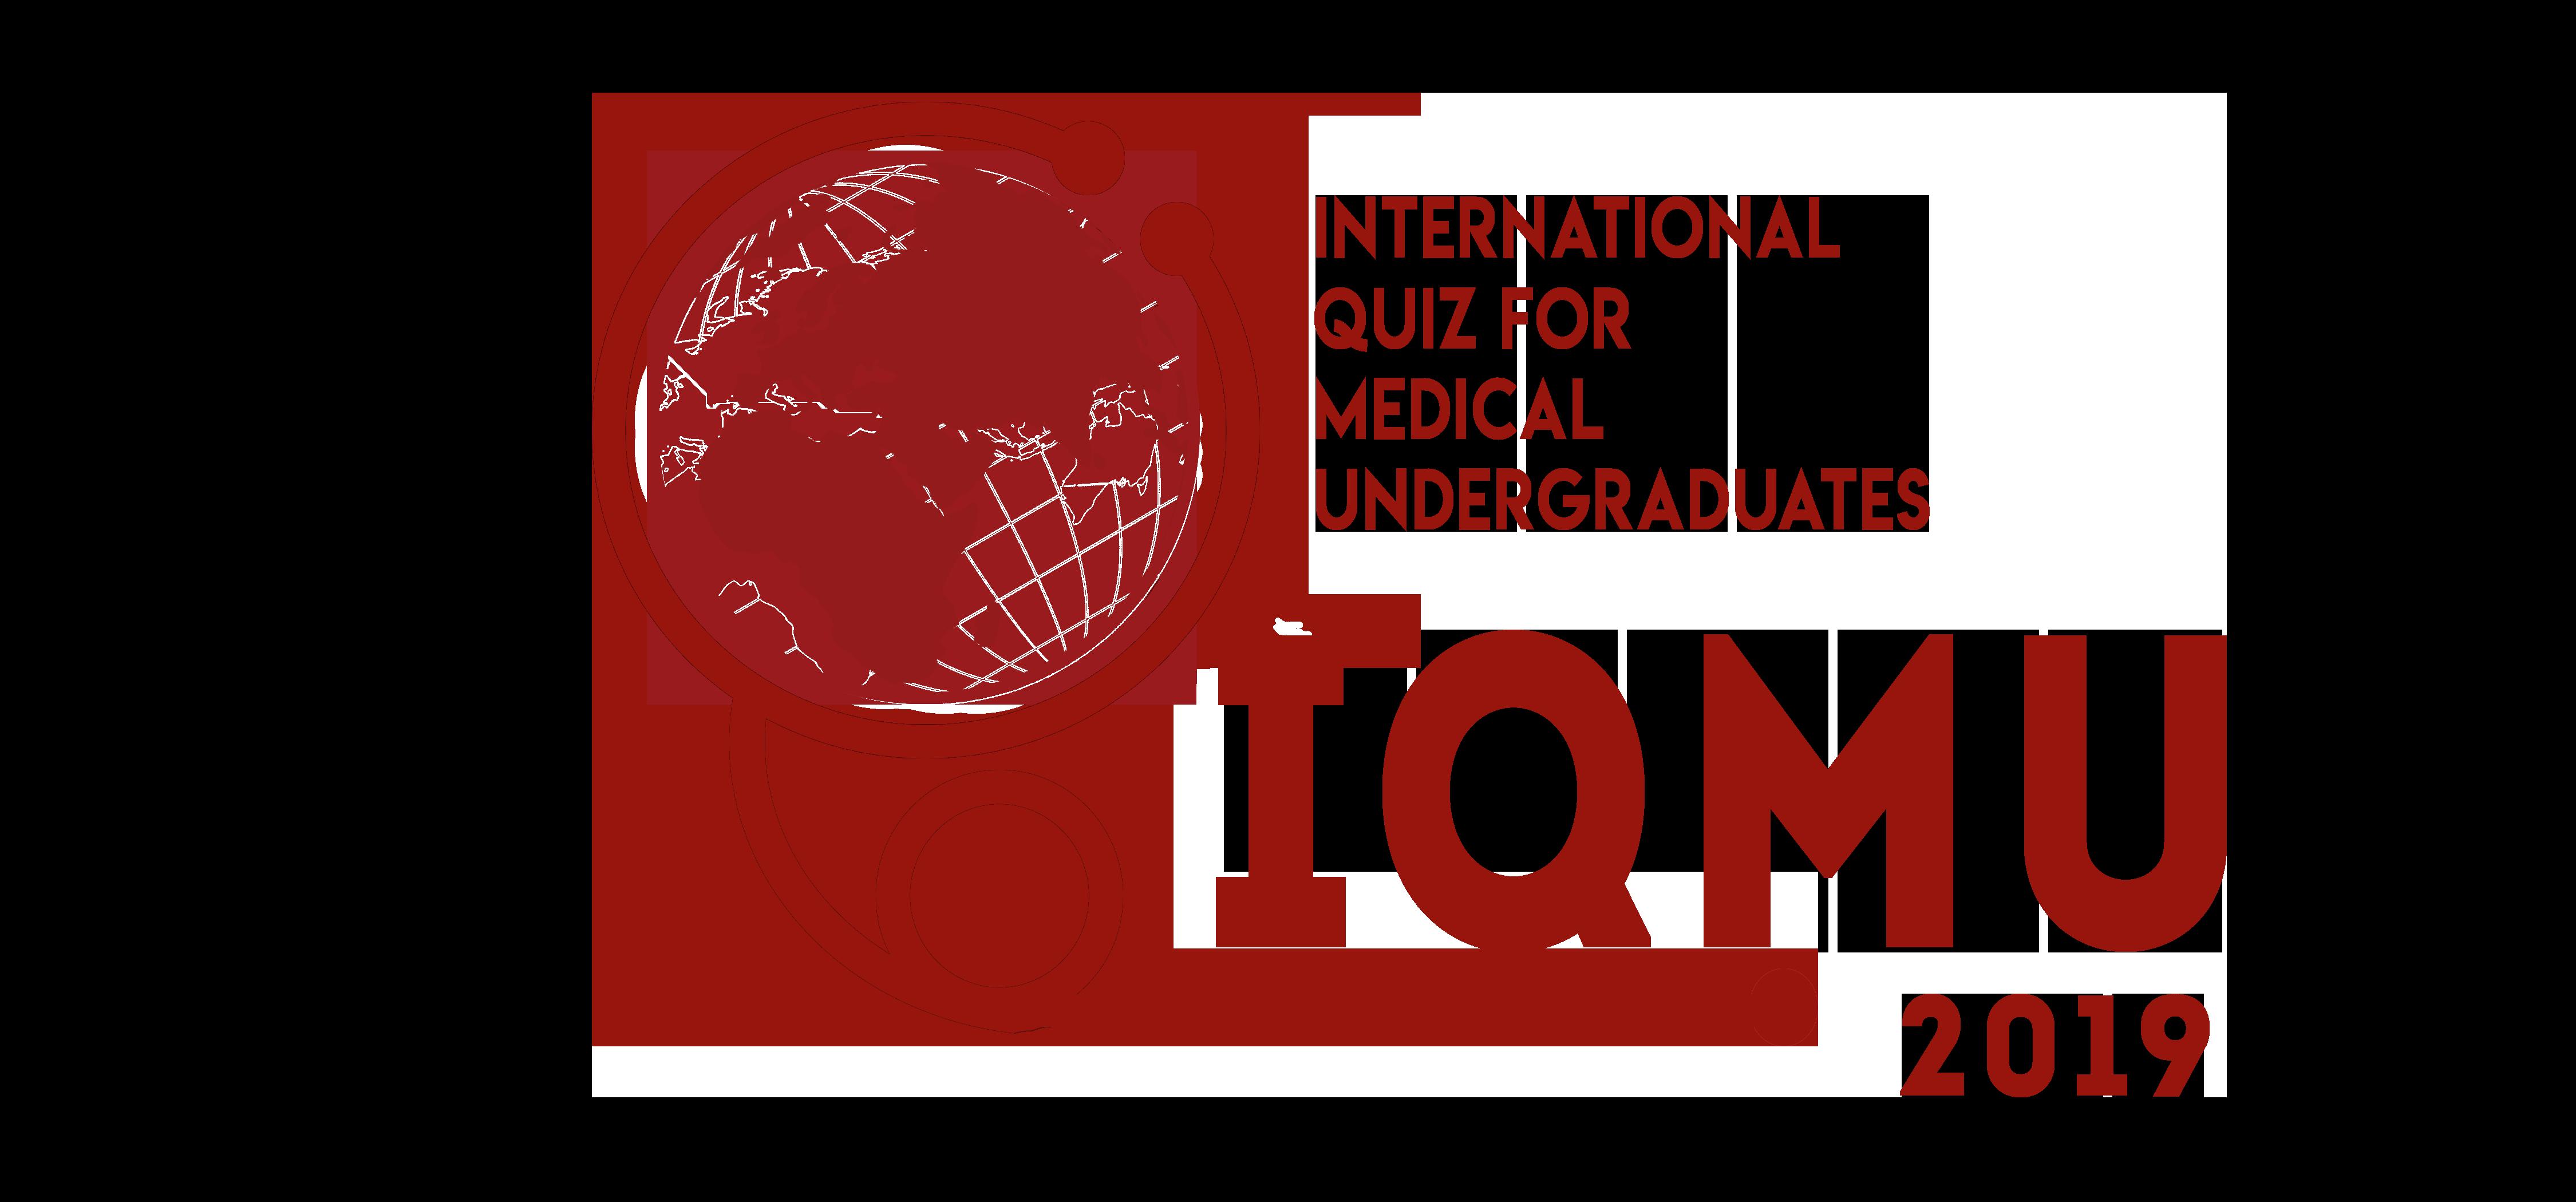 International Quiz for Medical Undergraduates, Kasturba